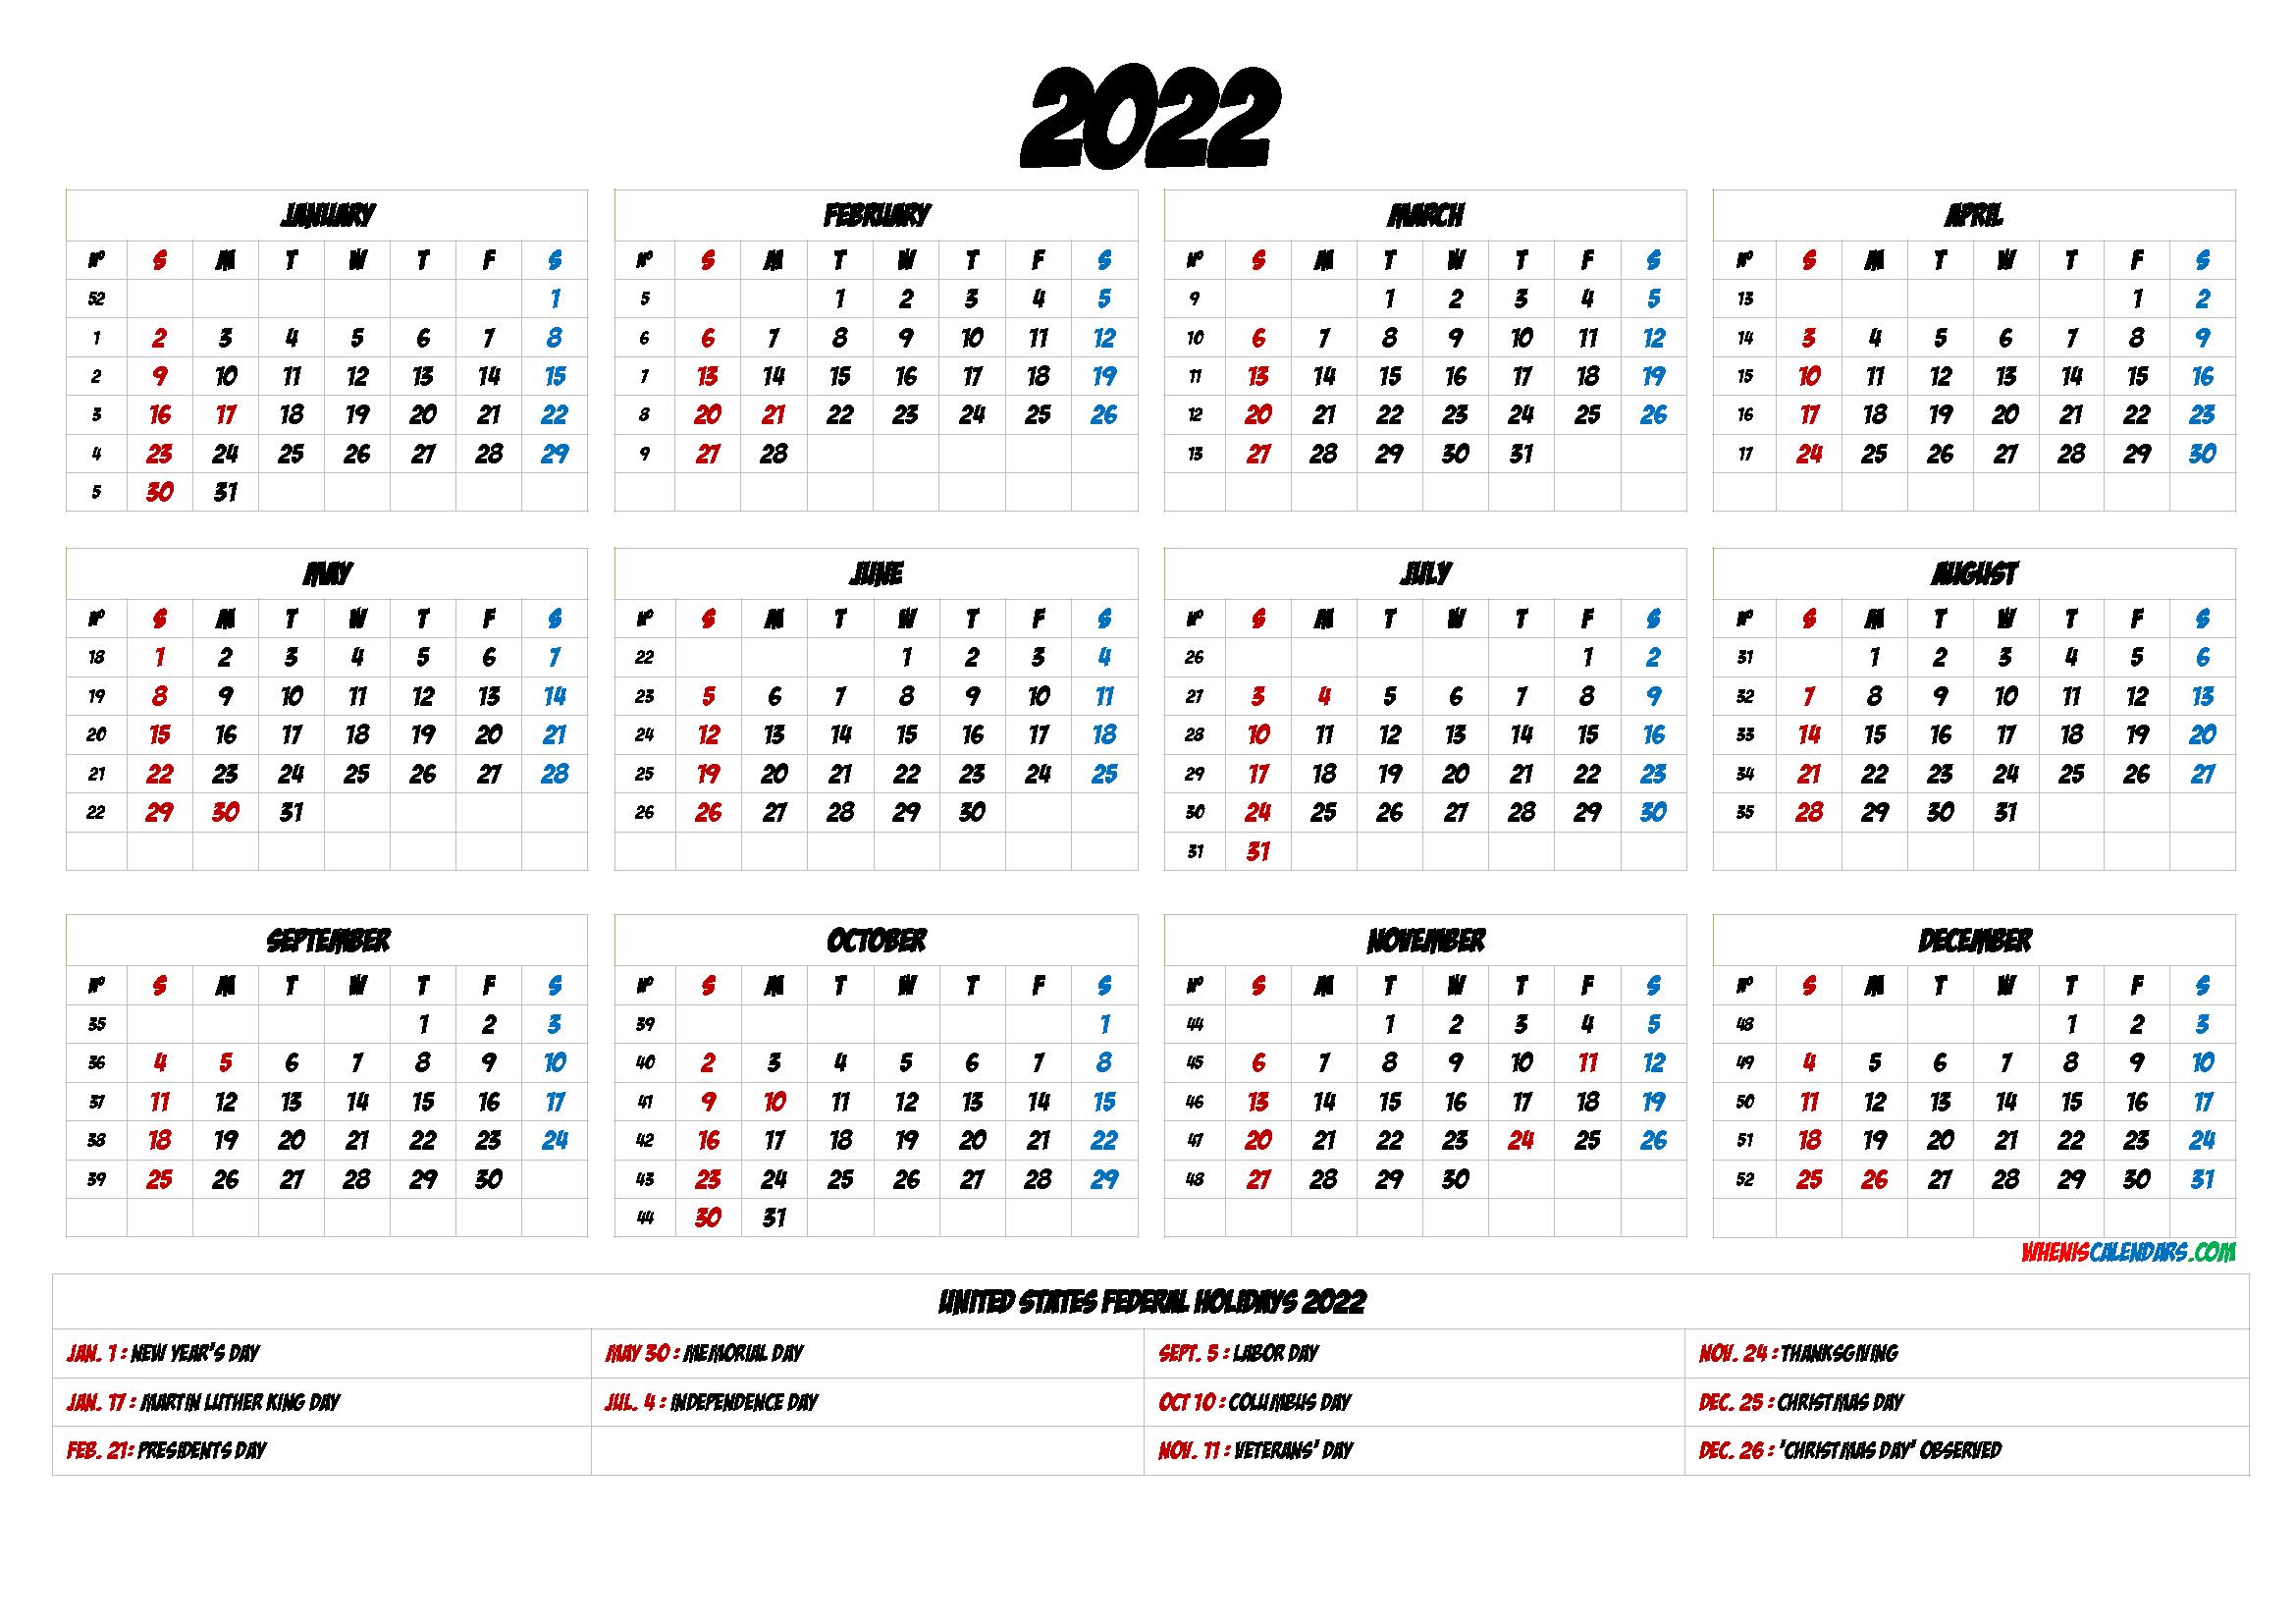 2022 Yearly Calendar Template Word.2022 Calendar Printable Pdf 6 Templates In 2021 Yearly Calendar Template Calendar Template Calendar Printables